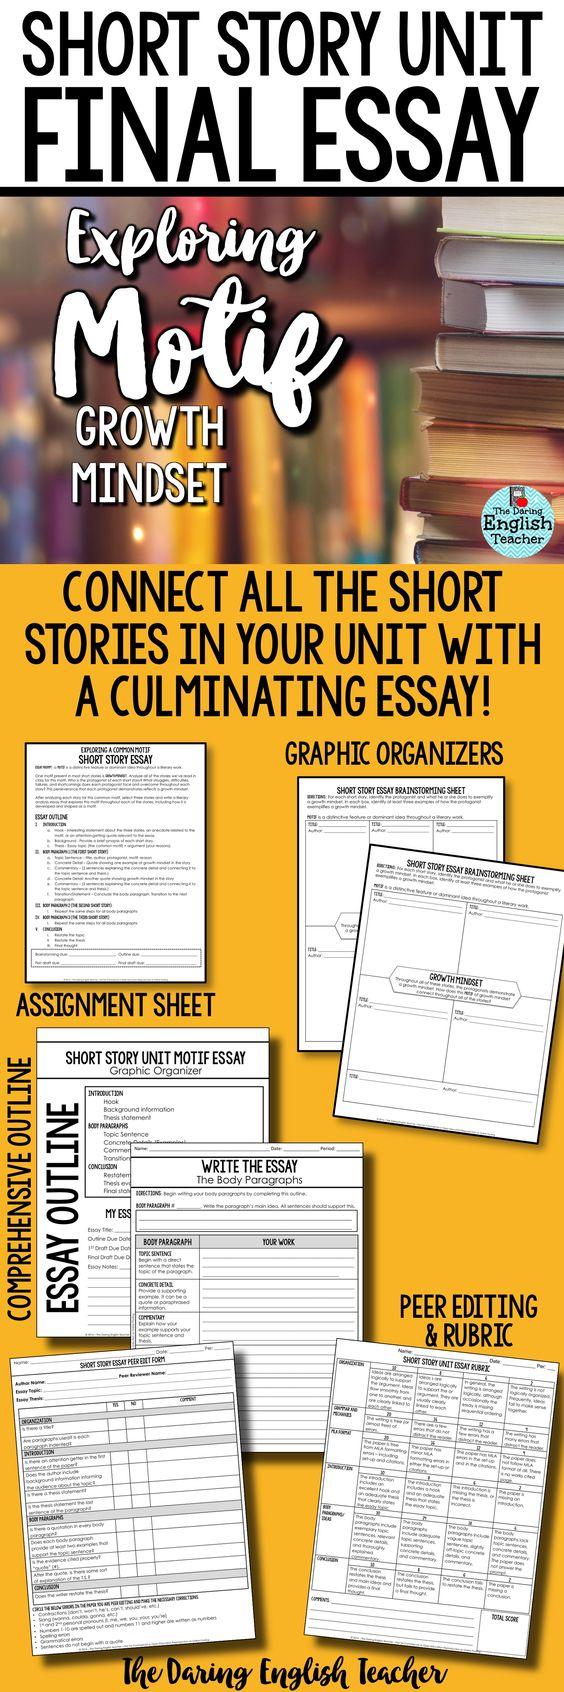 Short Story Unit Final Essay Analyzing Motif Growth Mindset